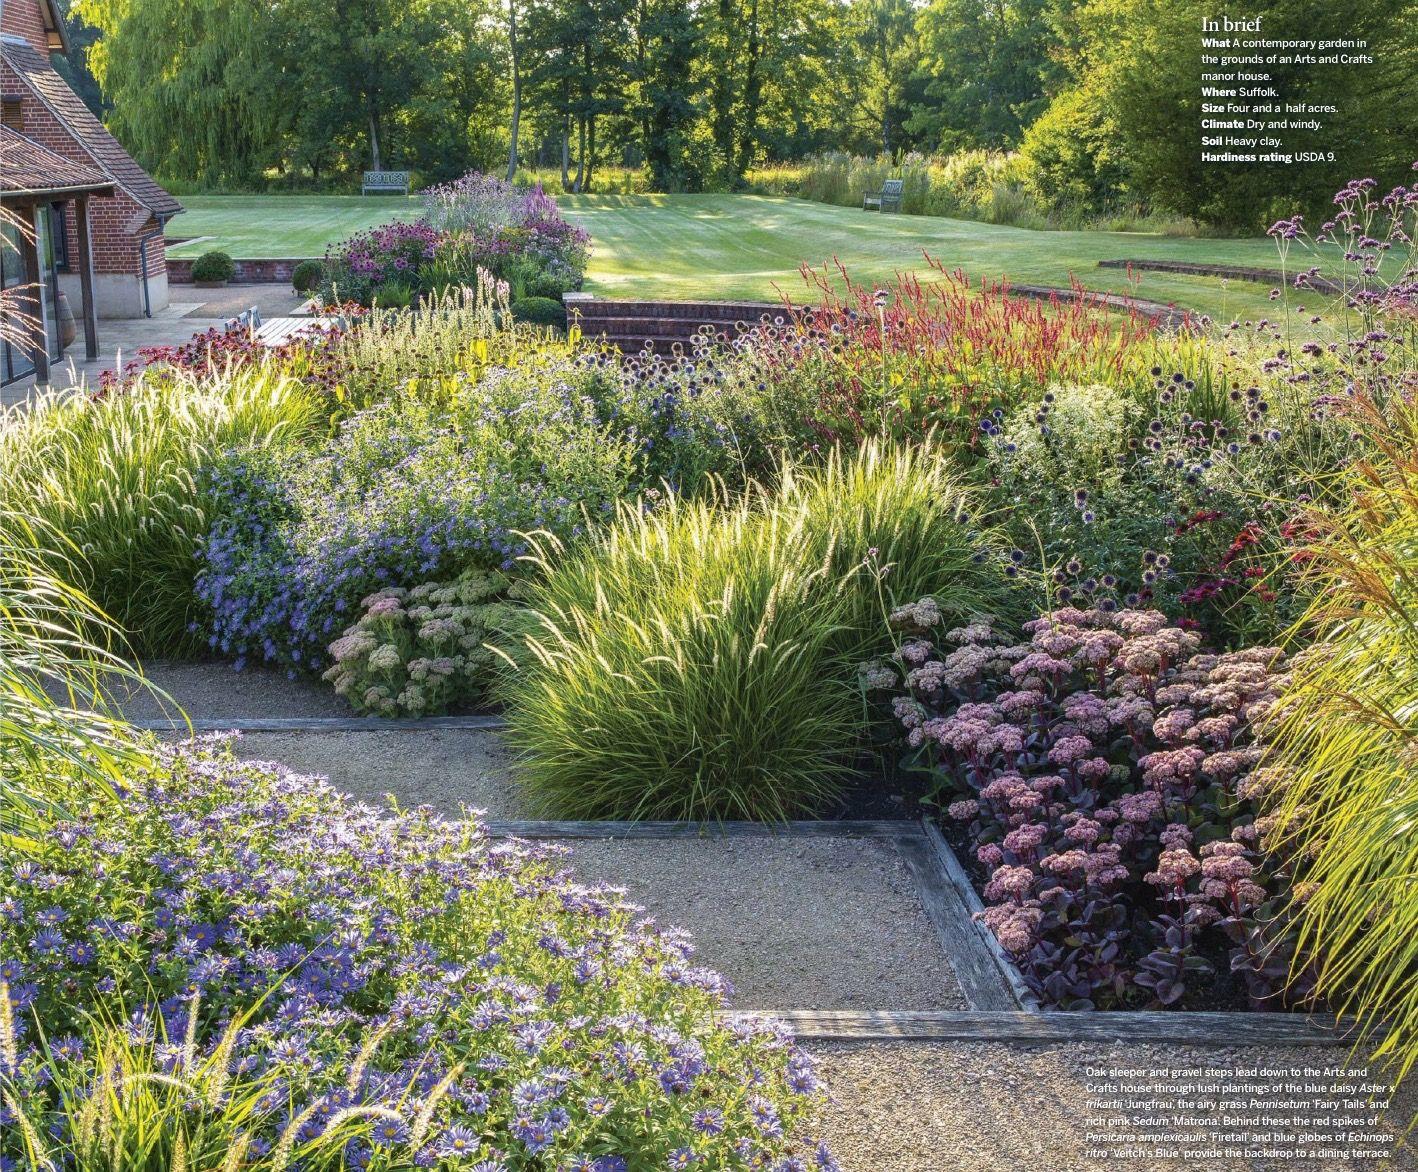 sue townsend arts and craft gardens